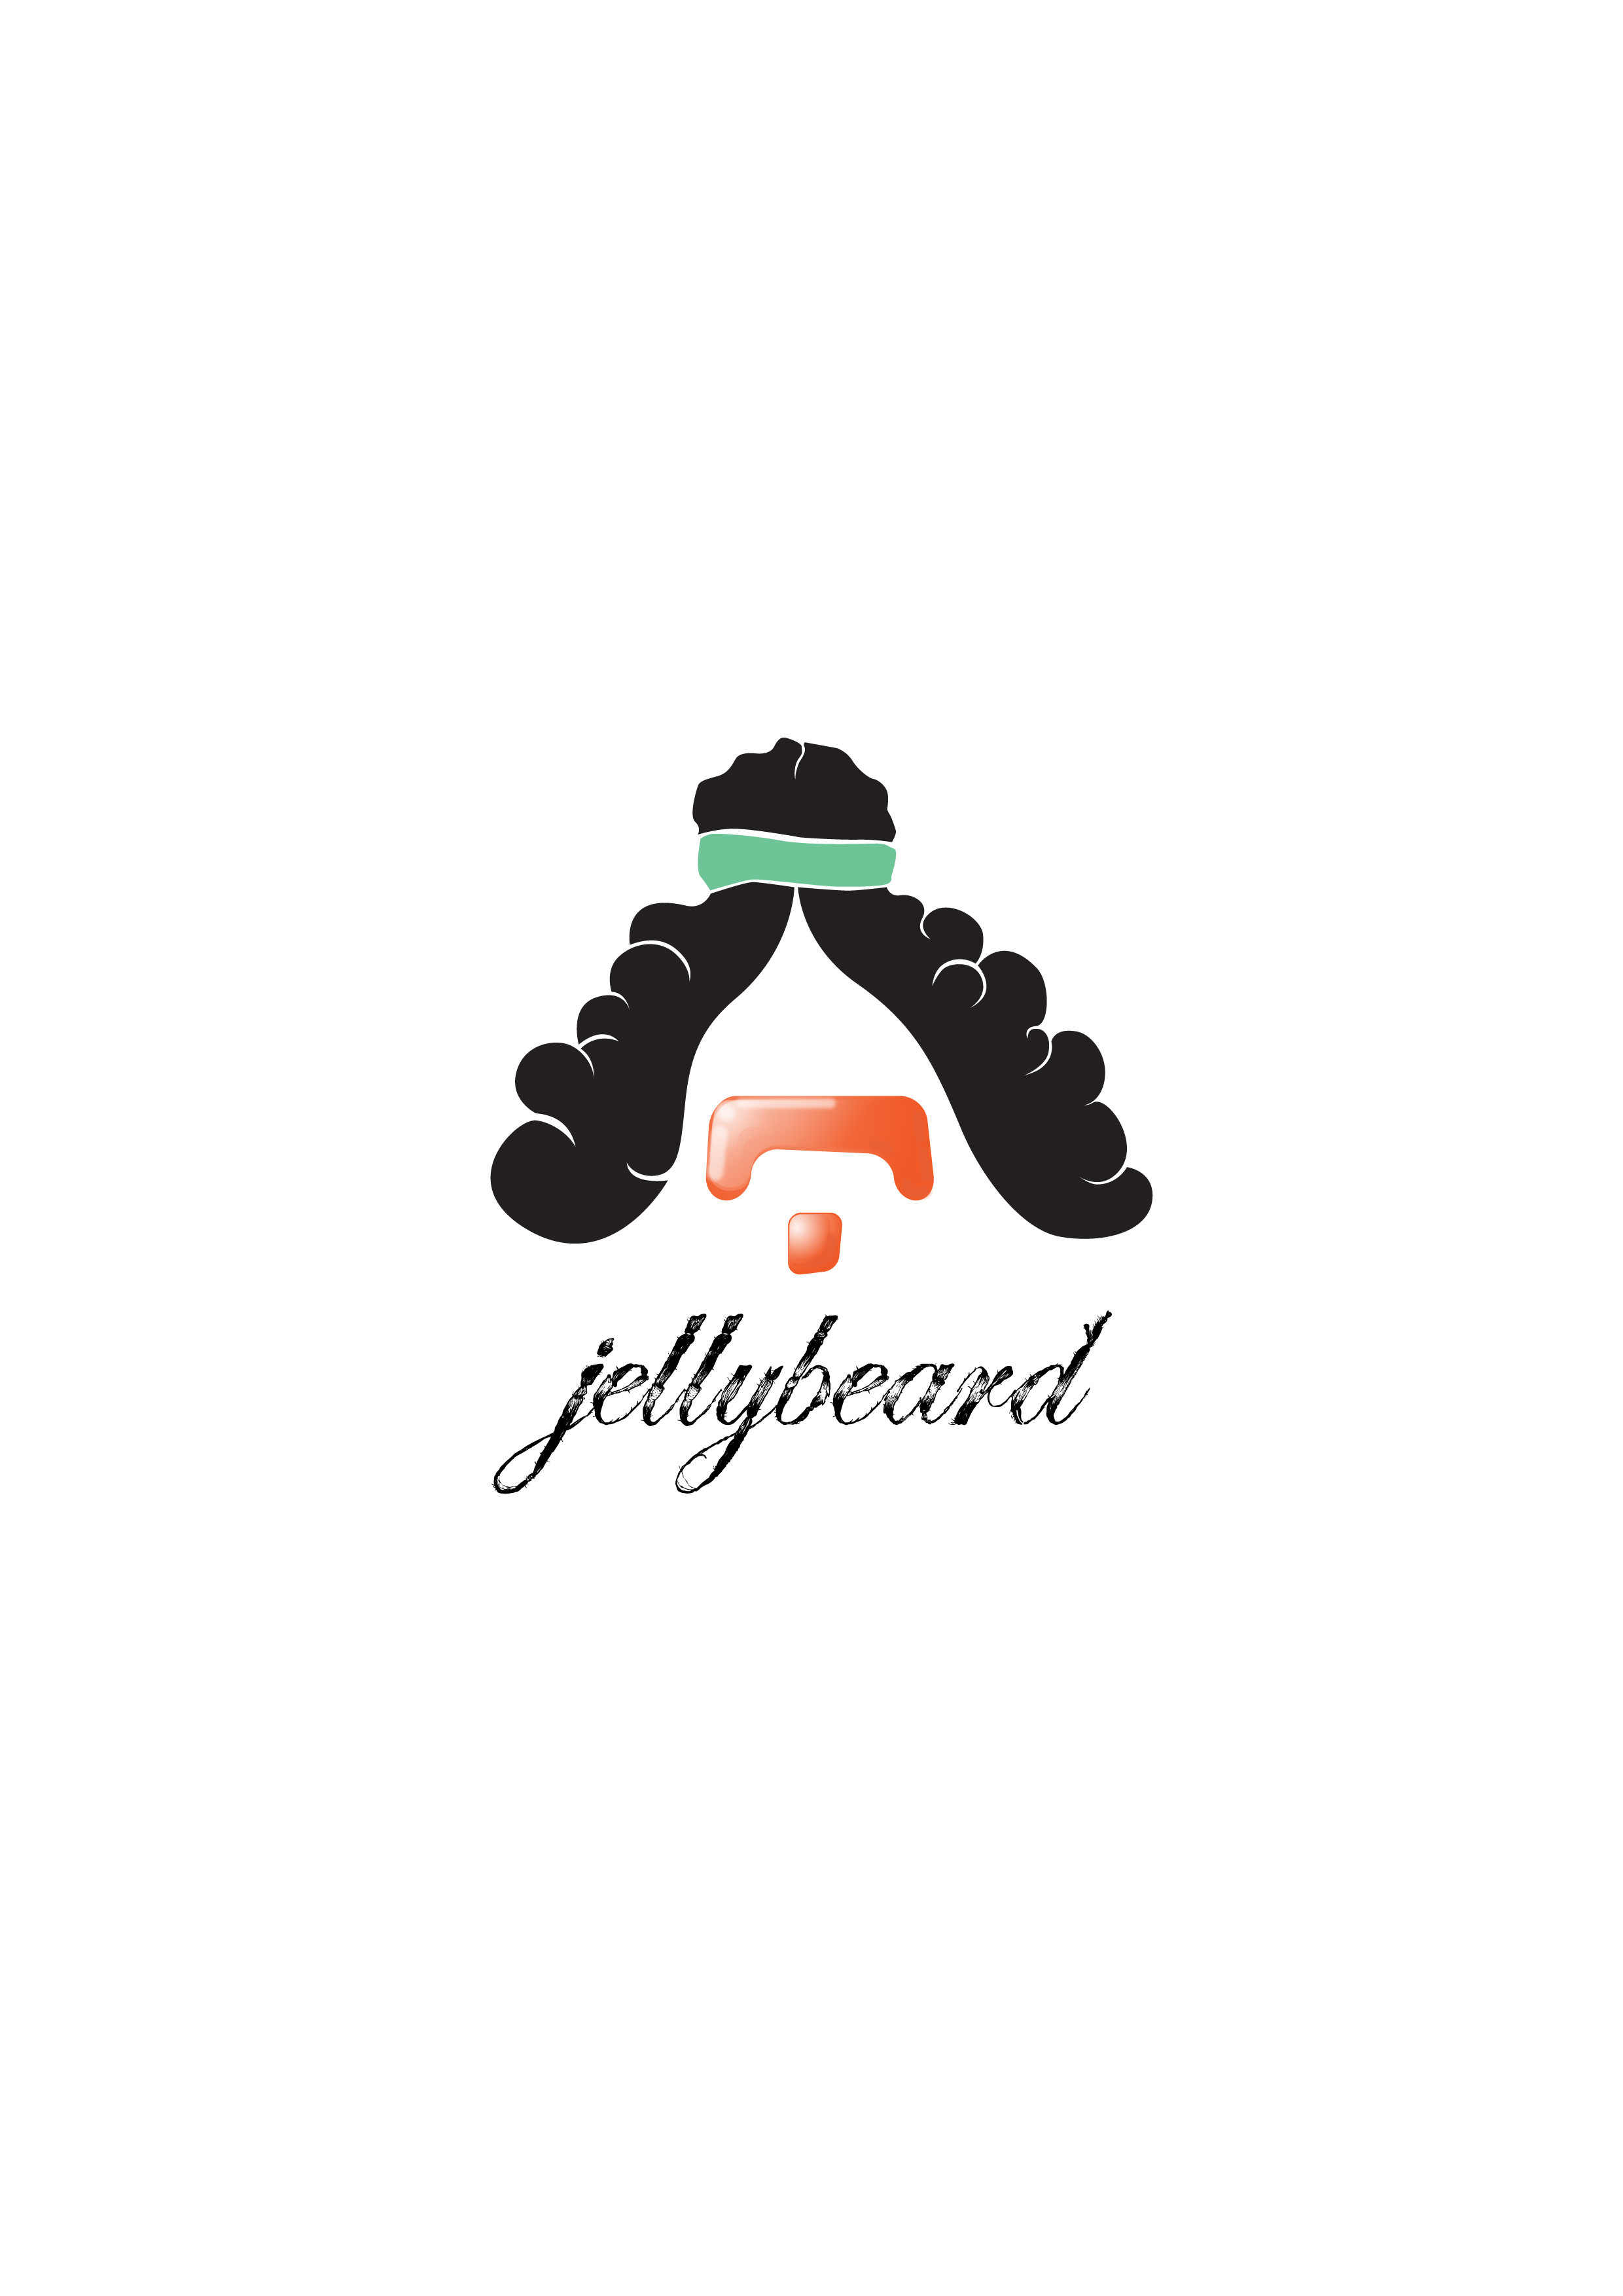 Logo Design by Private User - Entry No. 4 in the Logo Design Contest jellybeard Logo Design.